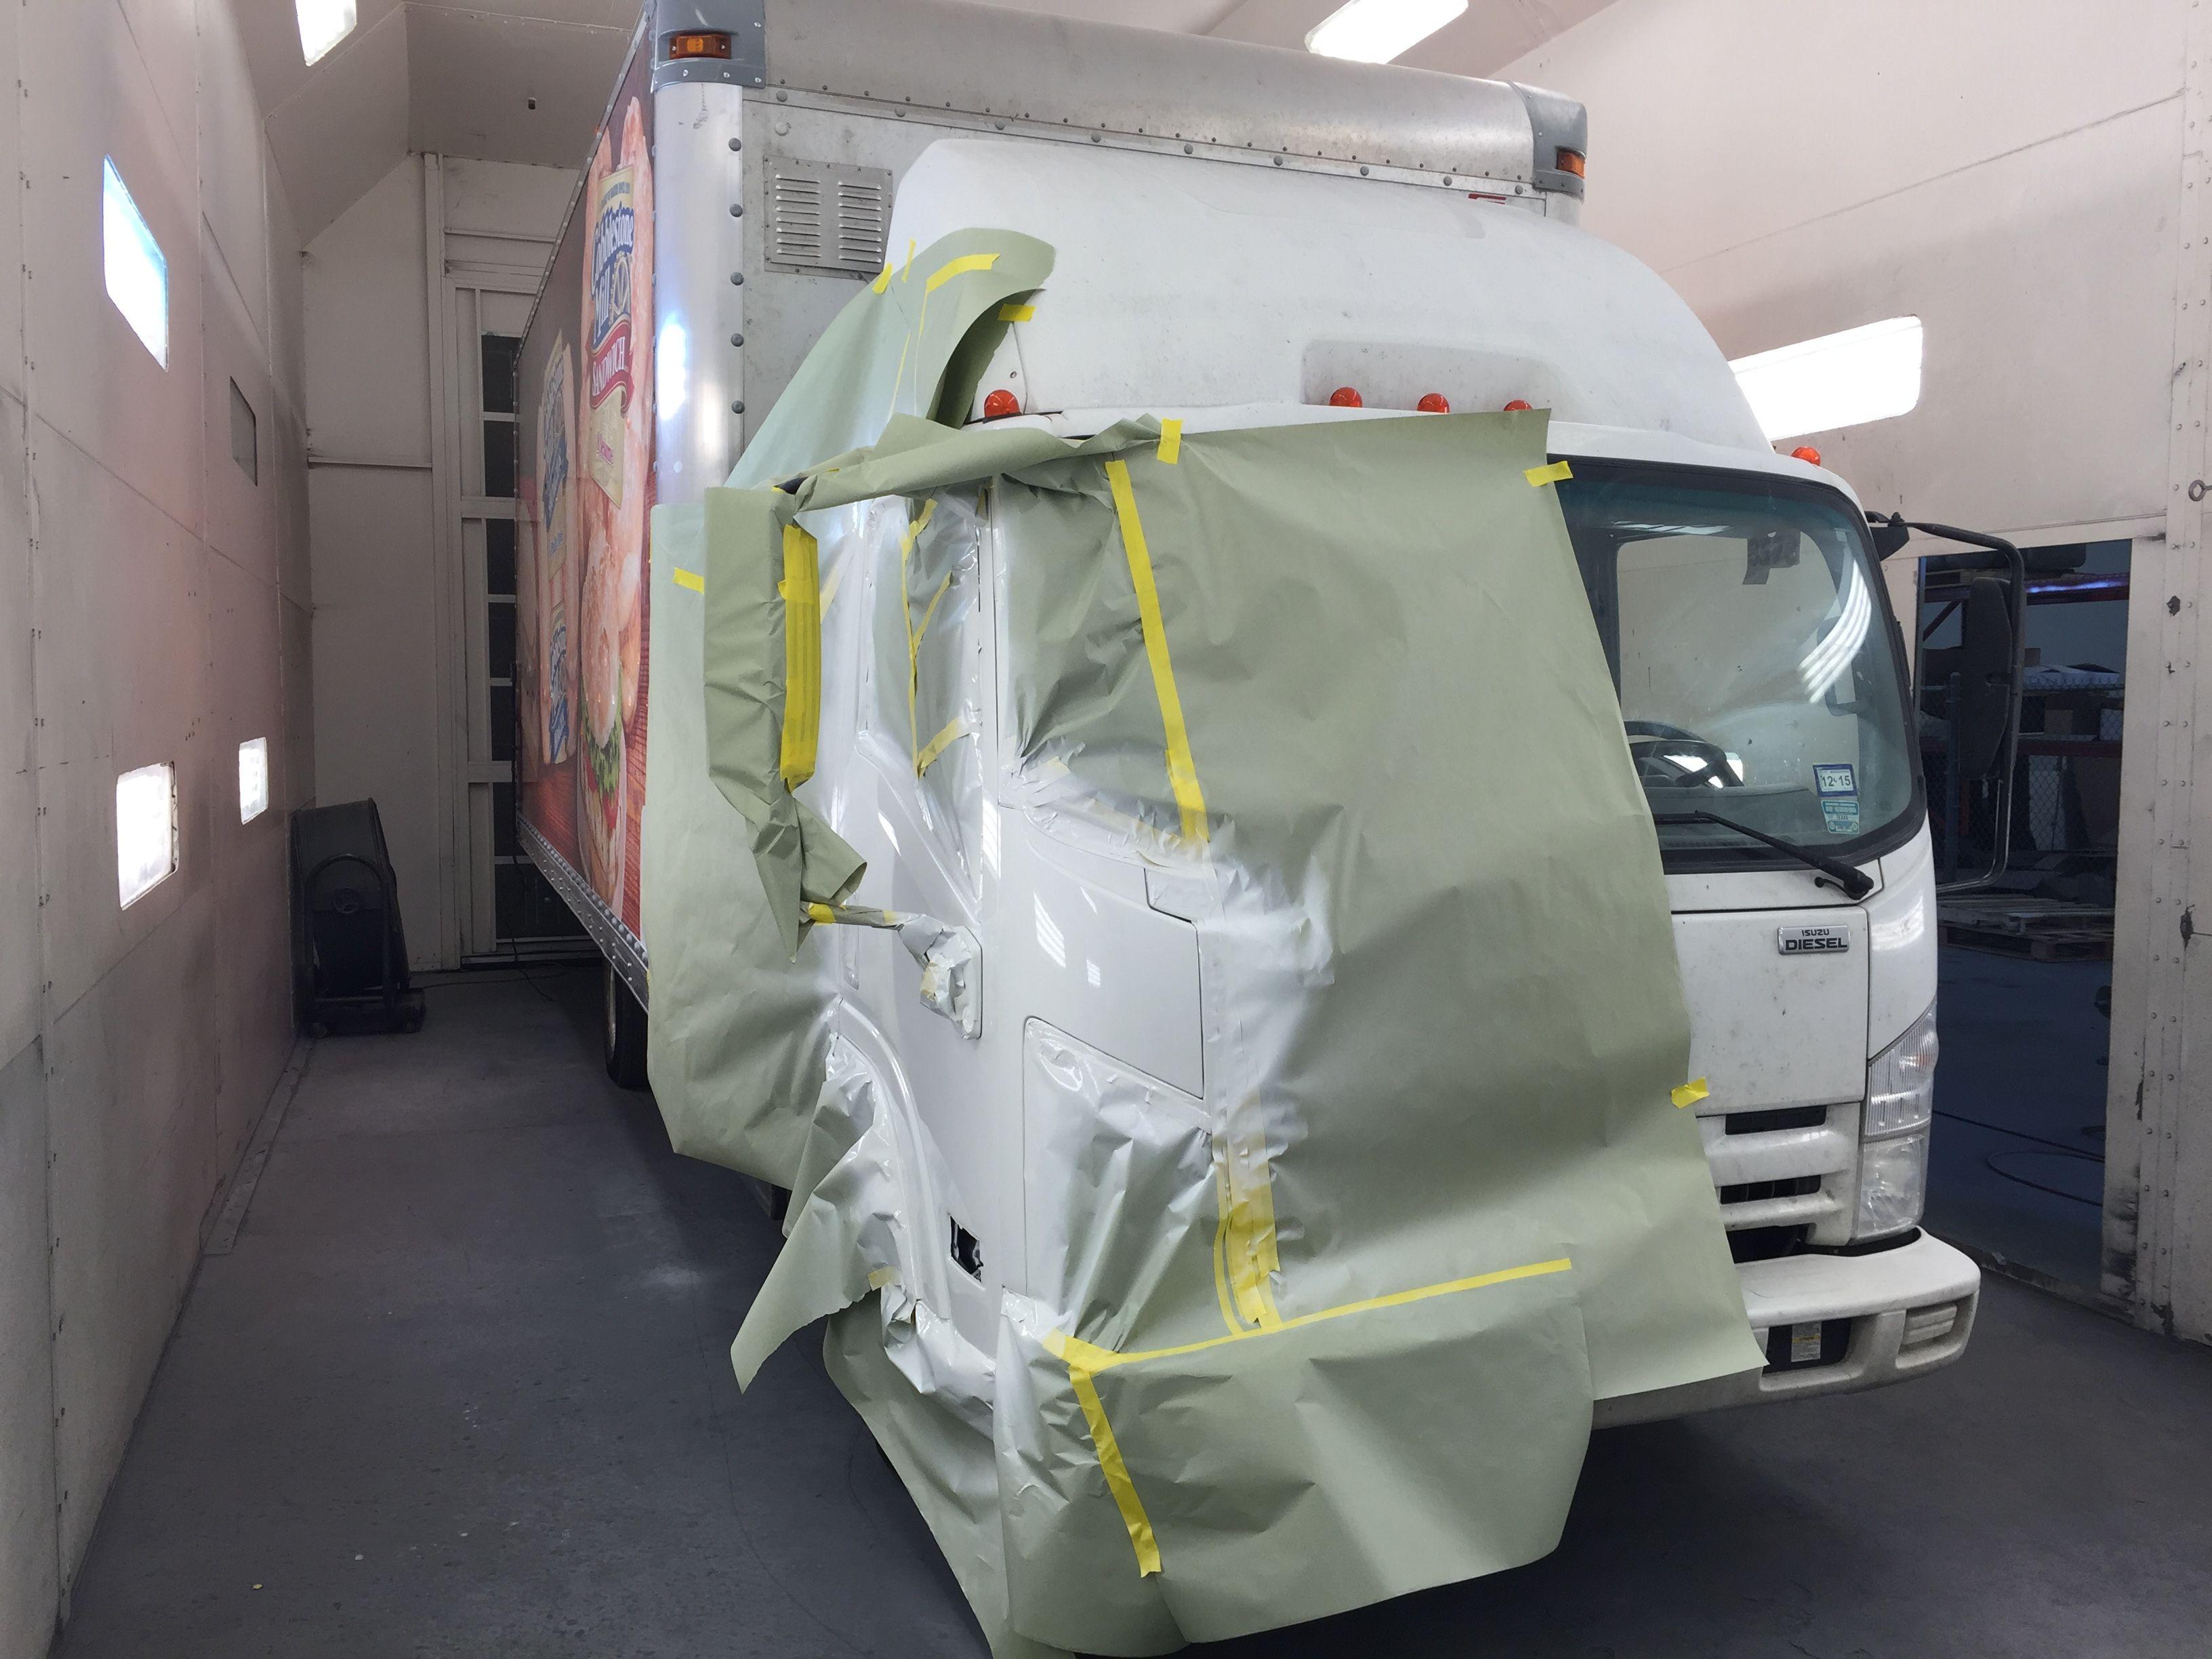 Isuzu Npr Box Truck Cab Repair In Progress Isuzu Npr Box Trucks The Body Shop Shopping Roll Up Doors